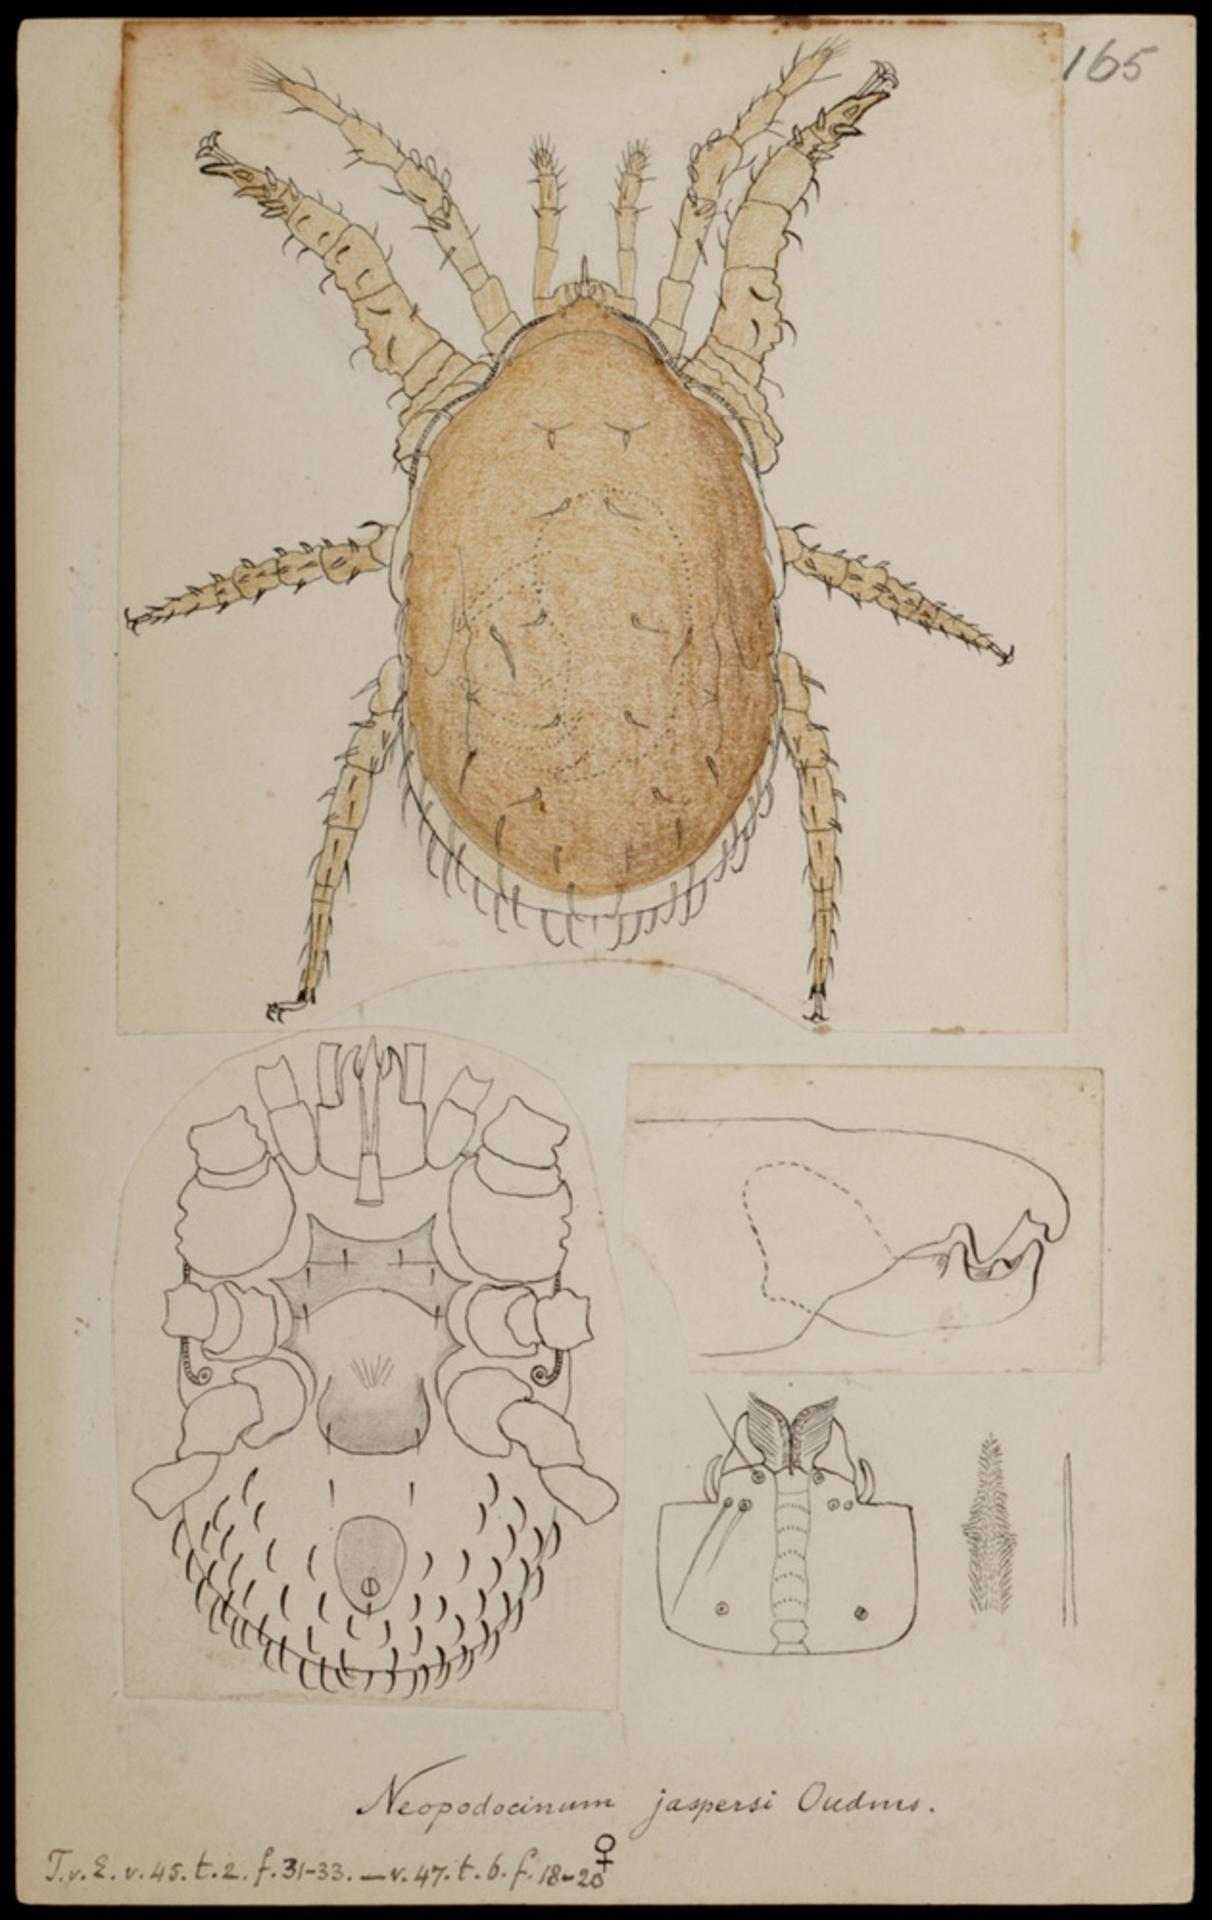 RMNH.ART.1025 | Neopodocinum jaspersi (Oudmans)